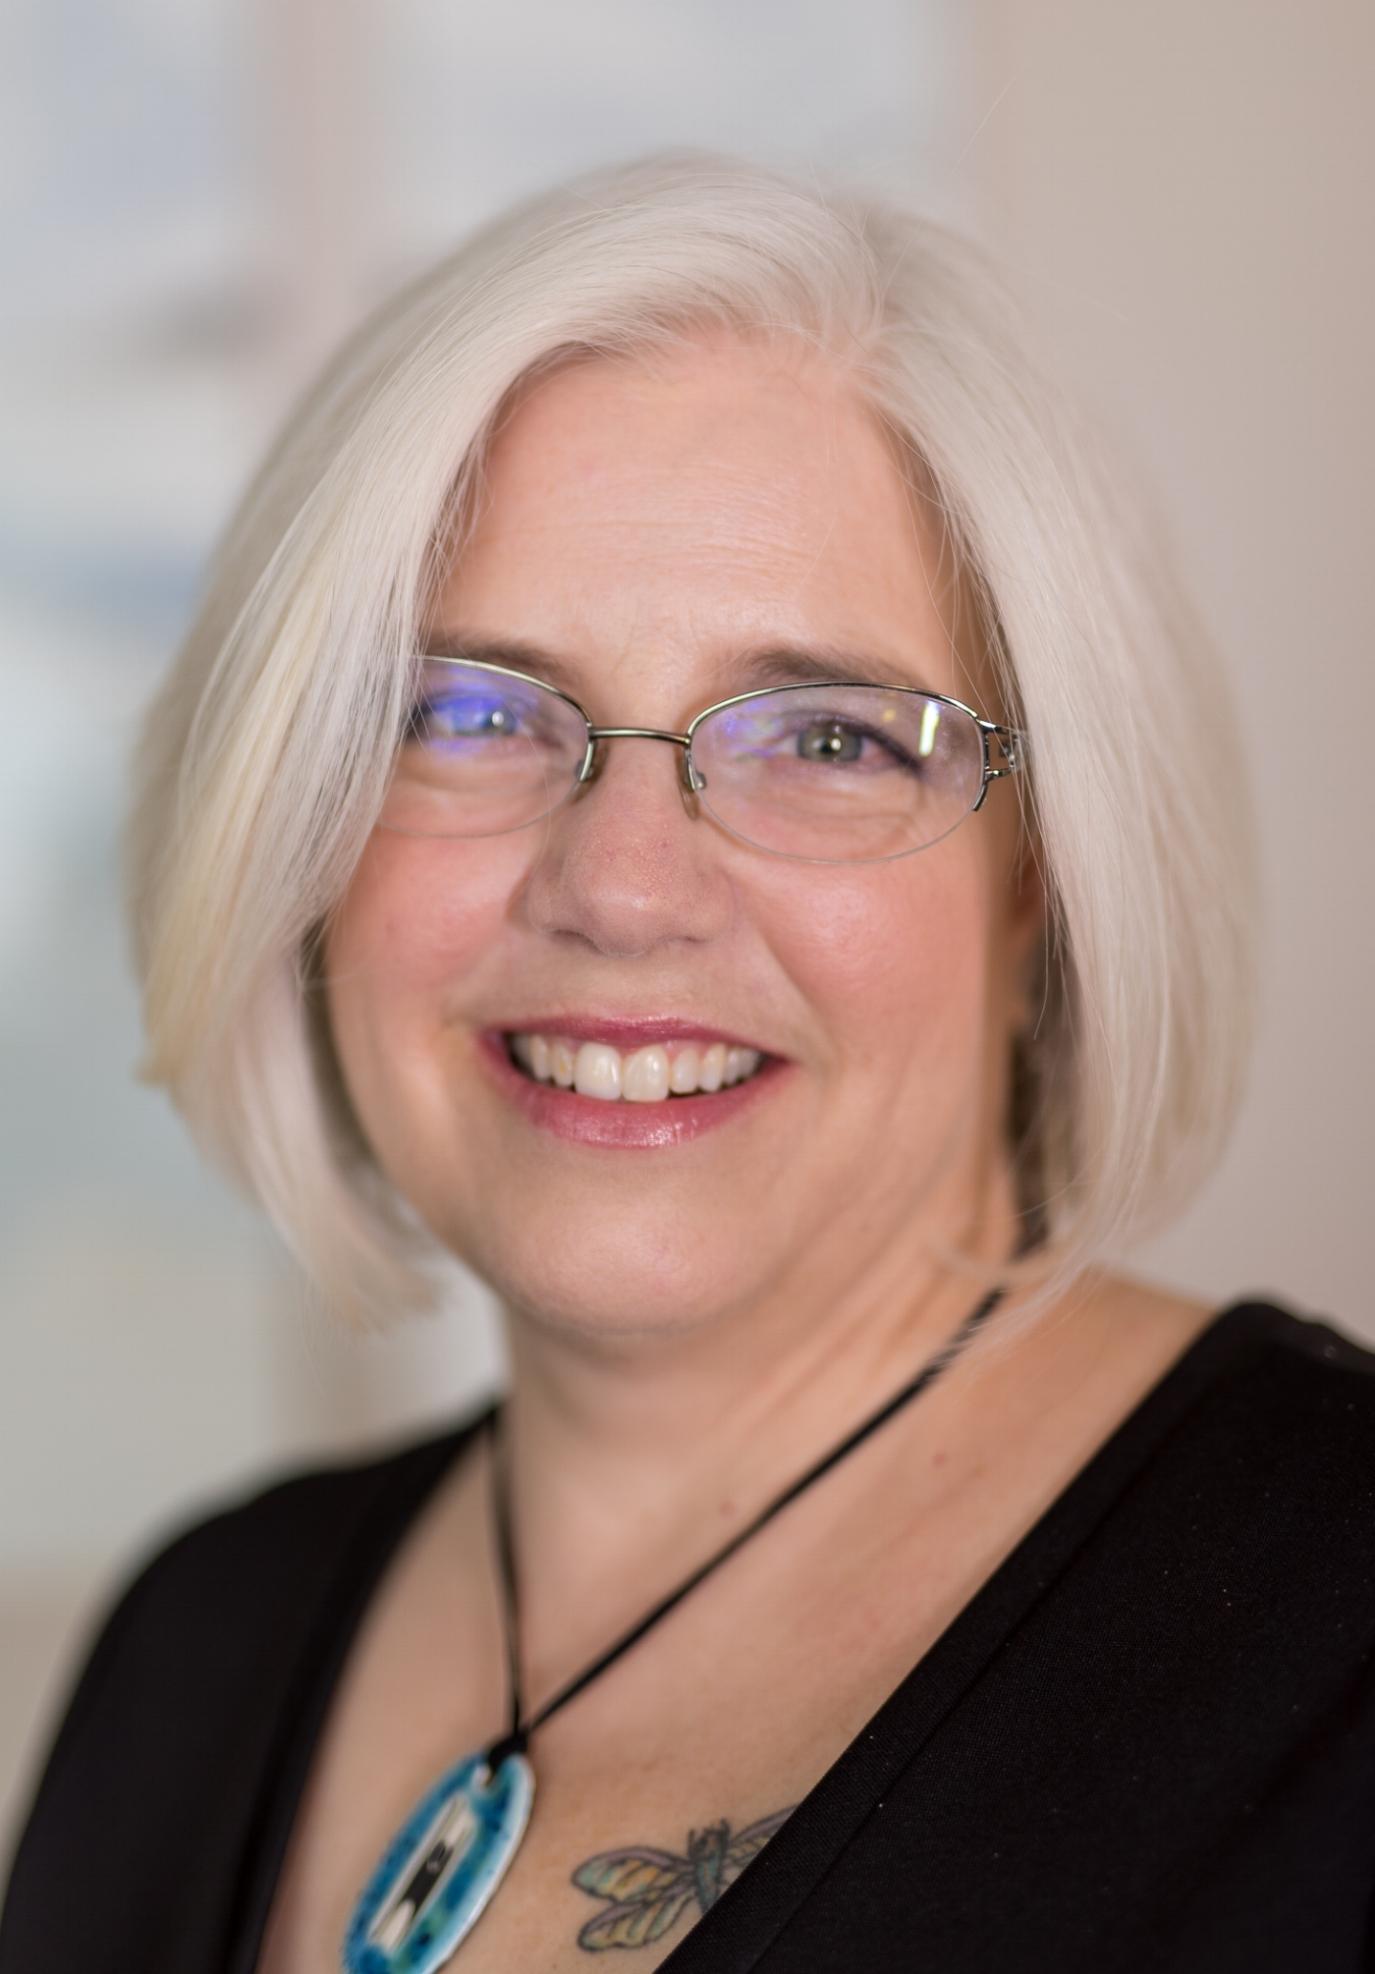 Benita Malone Humanist Celebrant